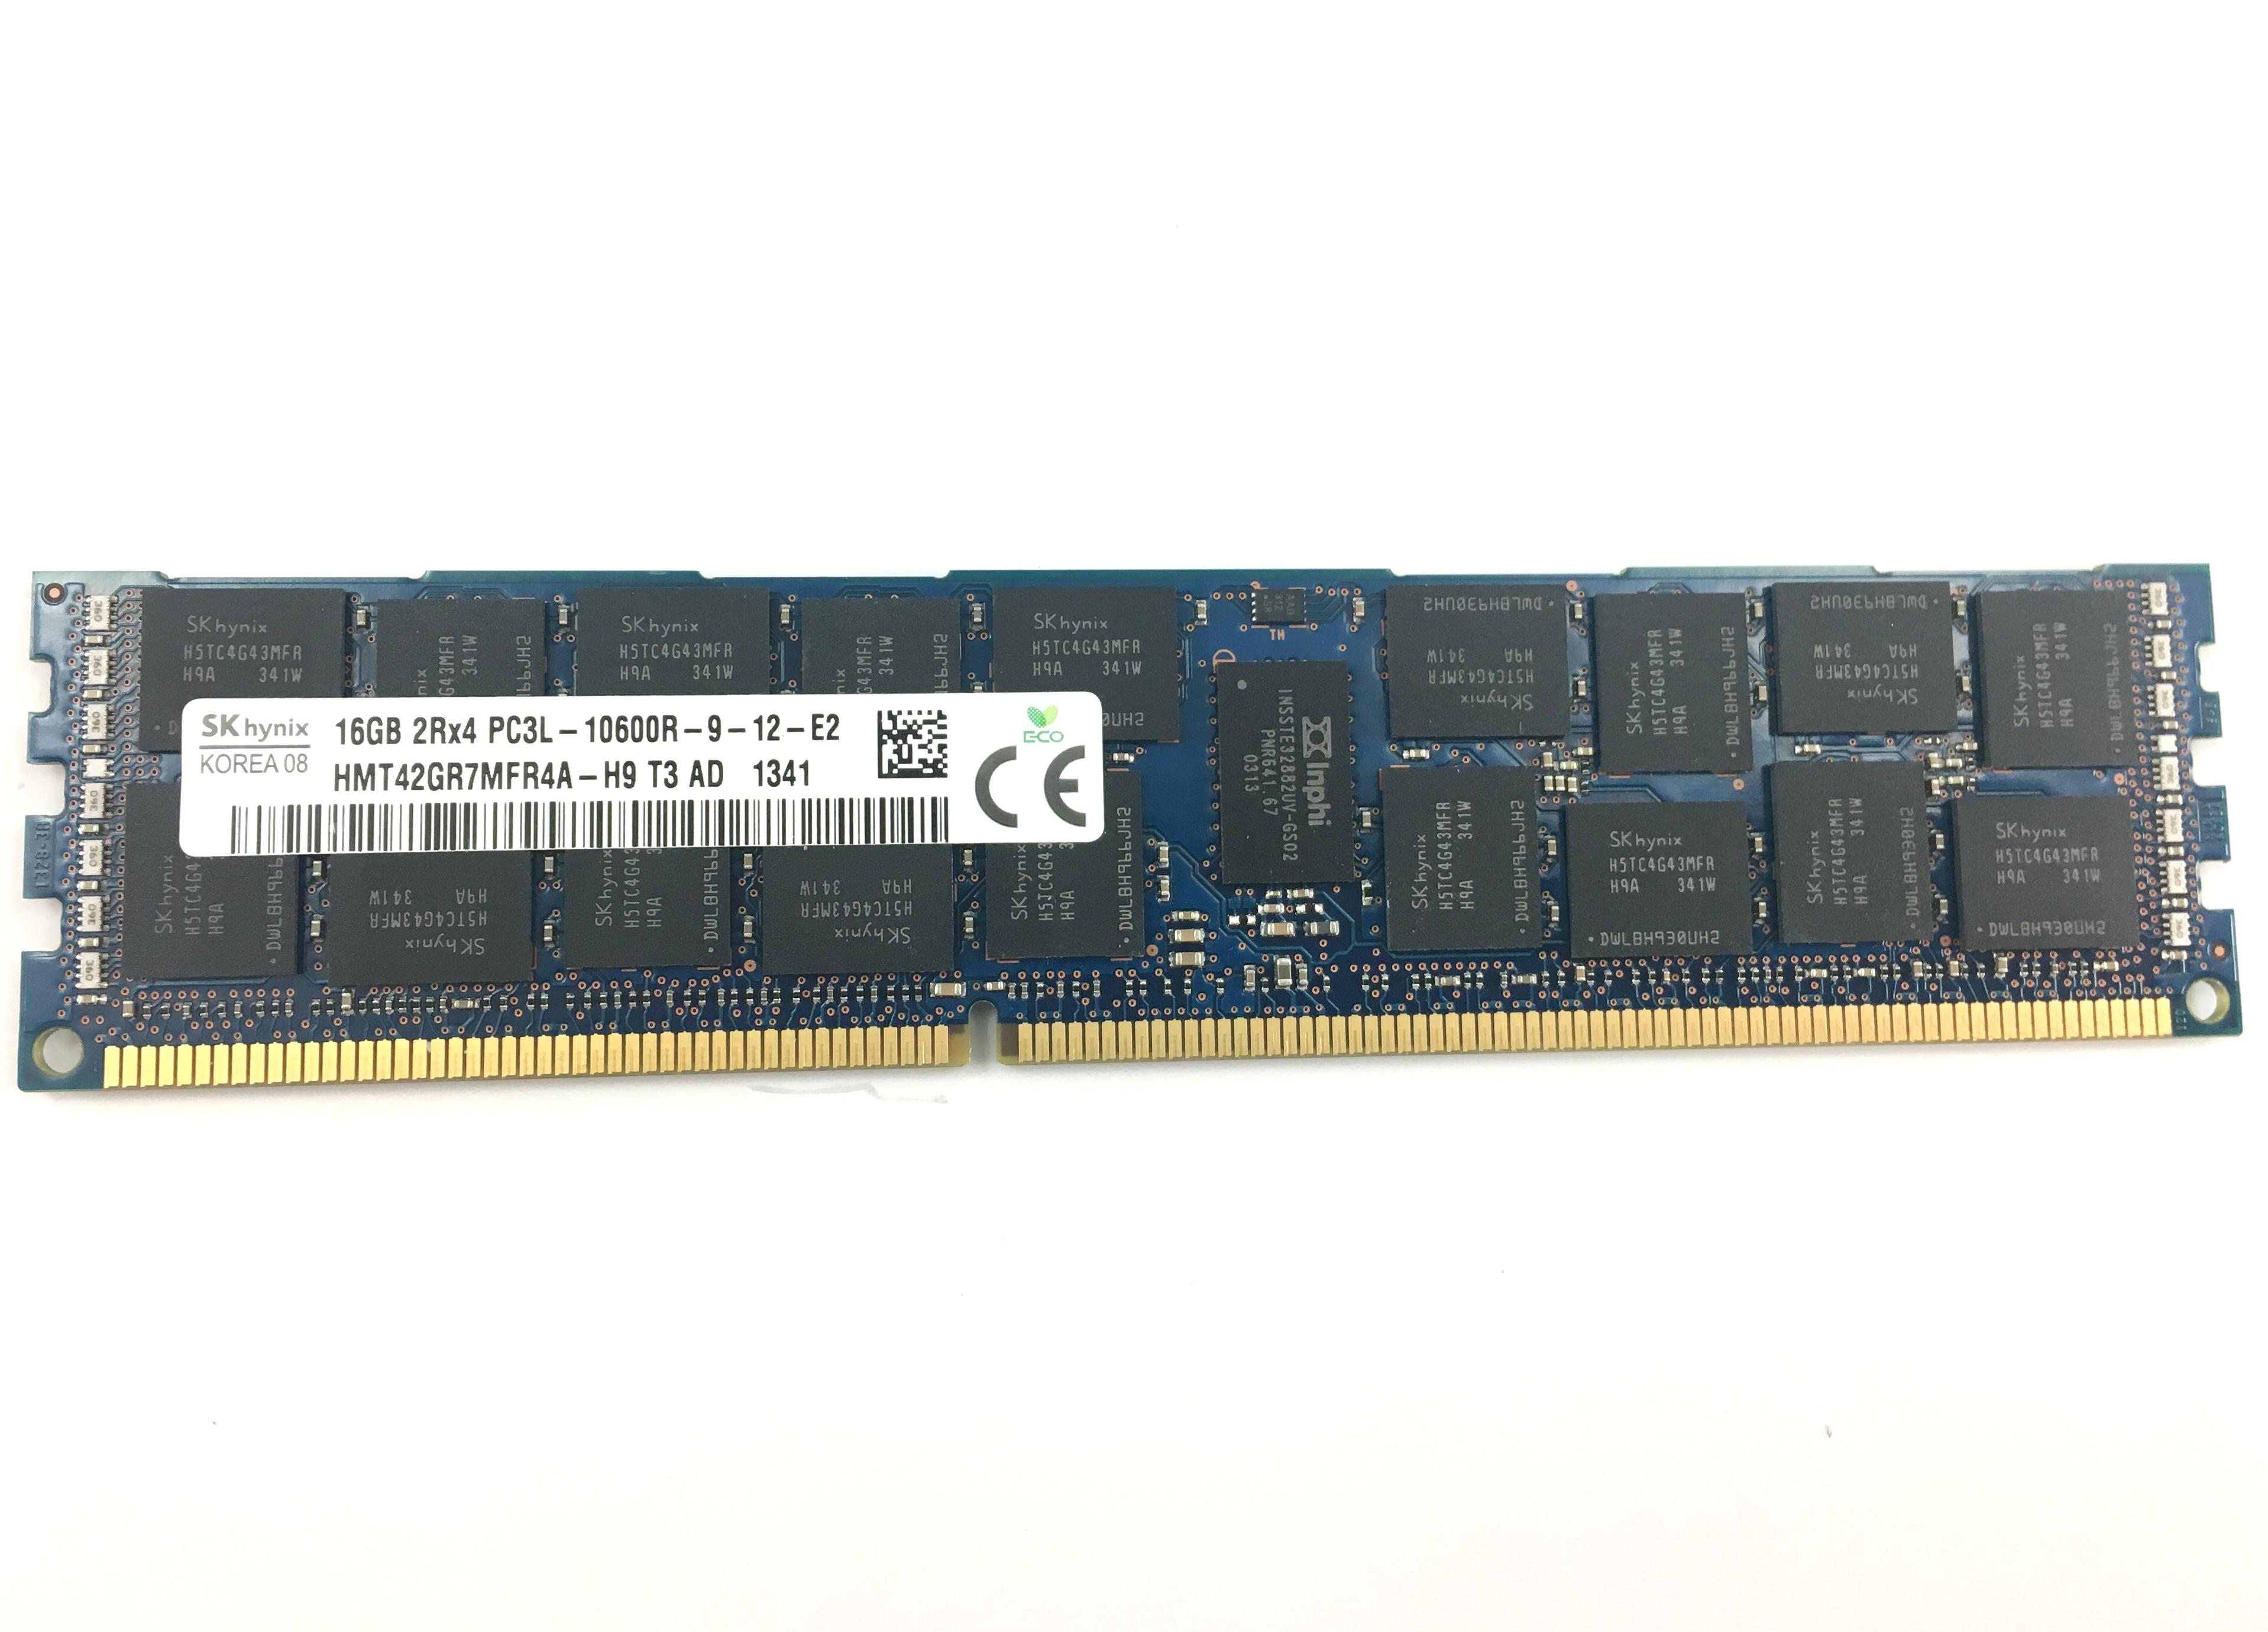 1x 8GB RAM Memory Supermicro Server Tested DDR3 ECC REG 2Rx4 PC3-10600R 1333Mhz